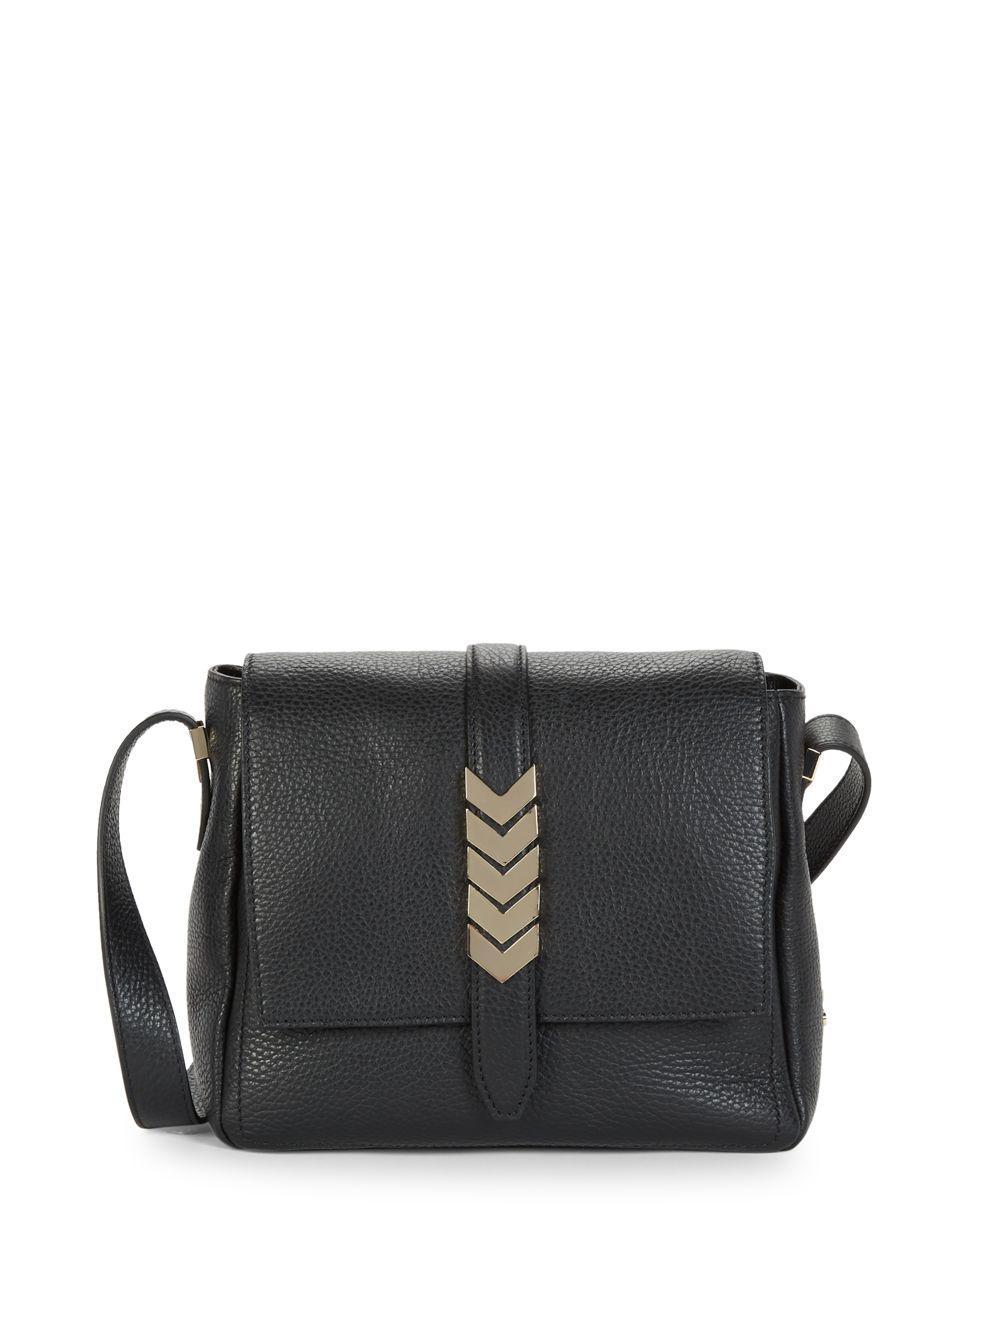 Versace Leather Shoulder Bag in Black - Lyst 2c9b61f21f145